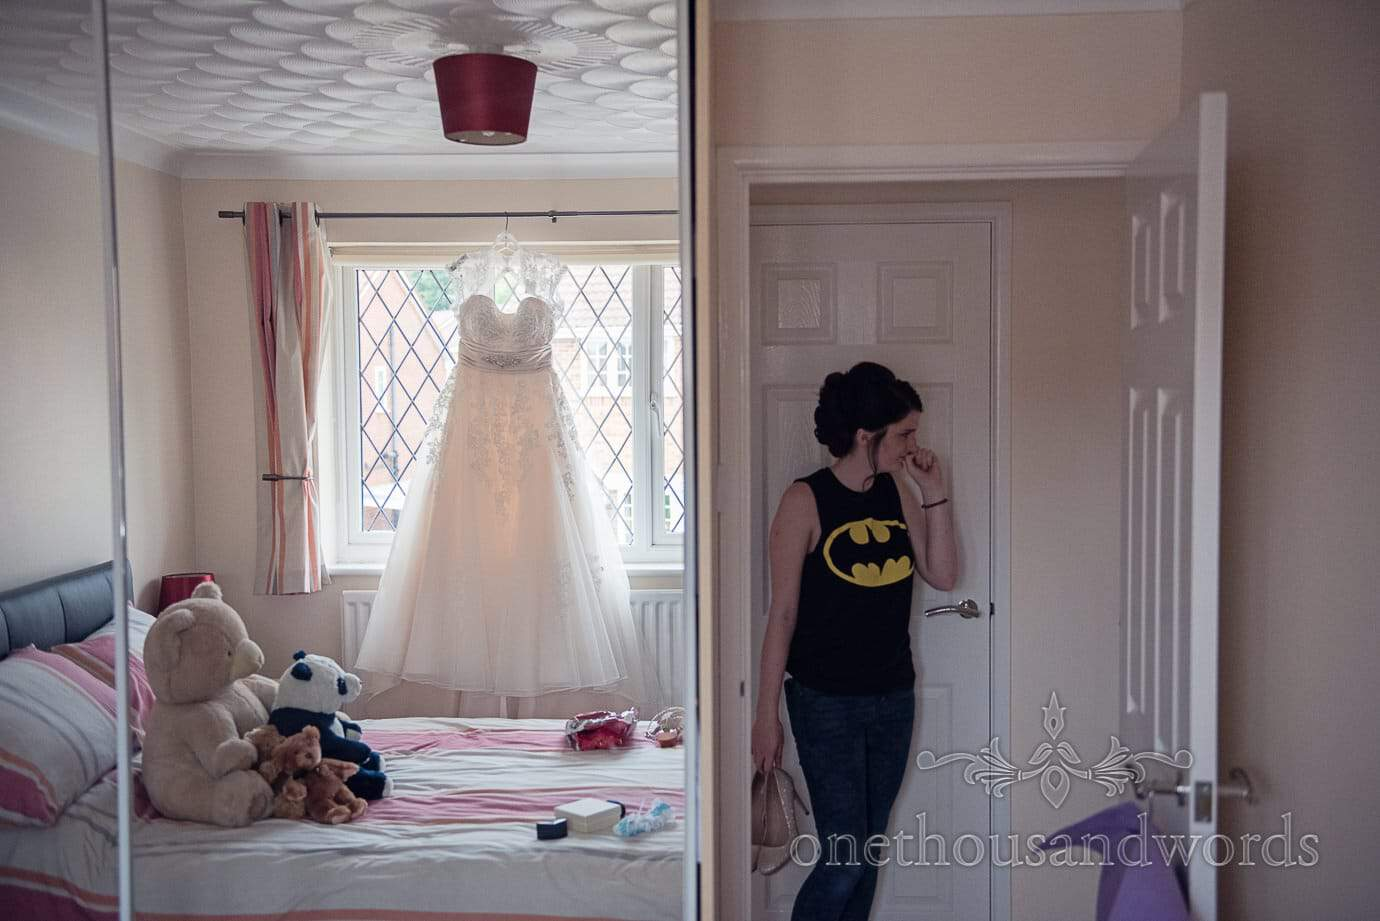 White wedding dress hangs in bedroom window on wedding morning